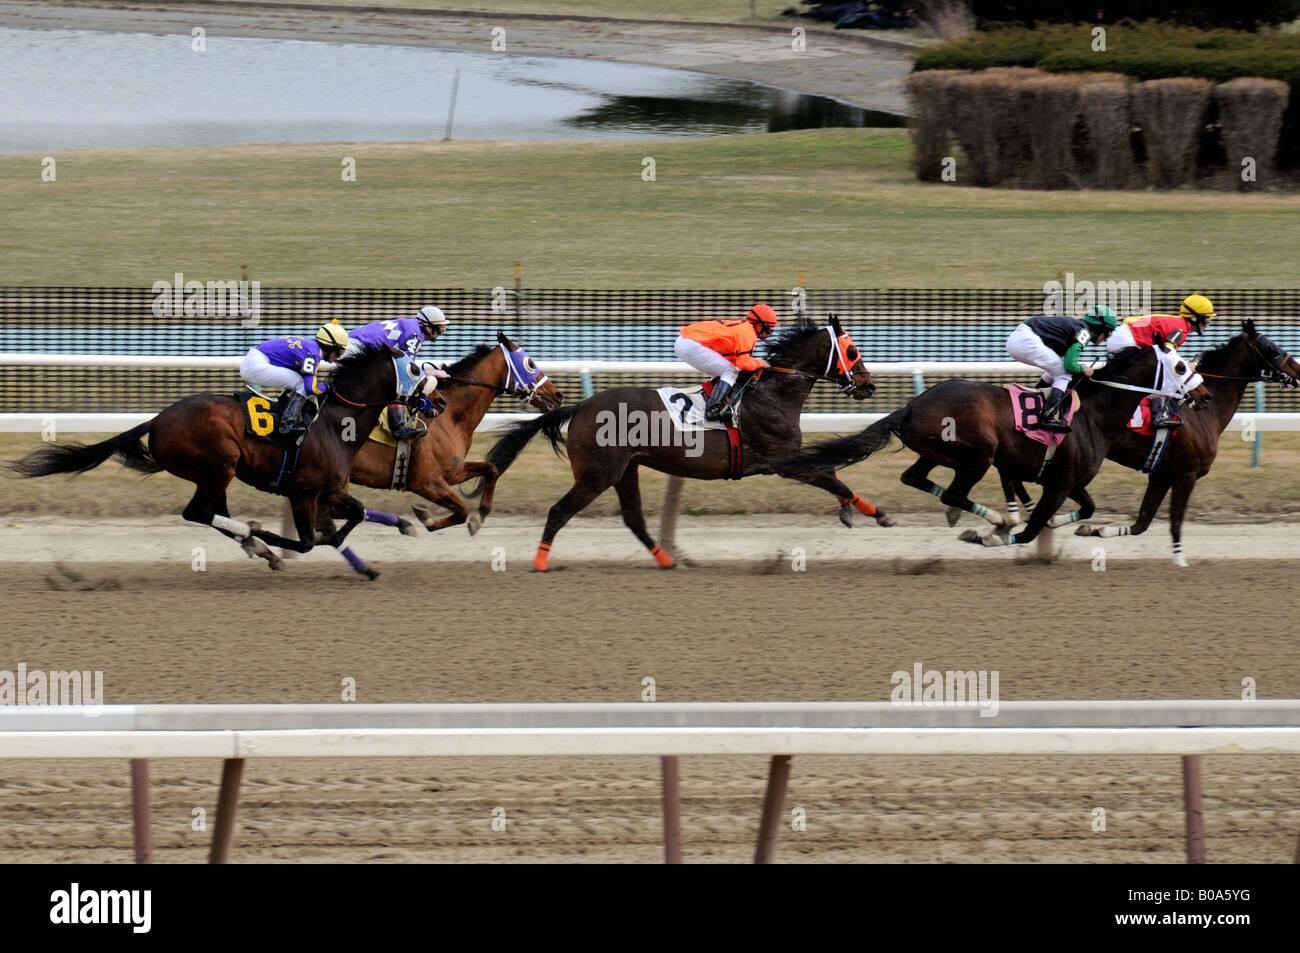 Horses racing at Aqueduct Race Track New York City - Stock Image